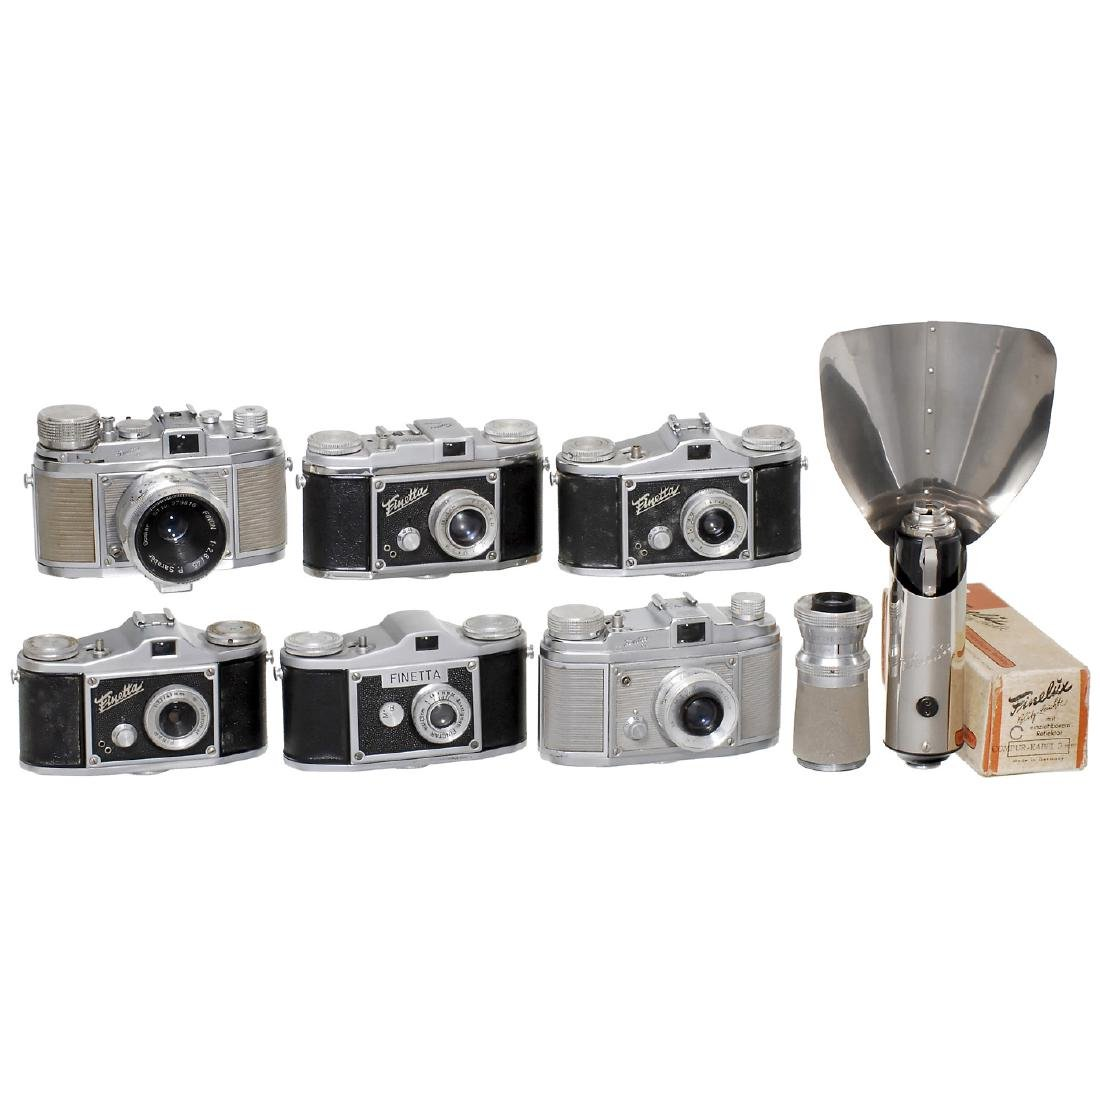 6 Finetta Cameras